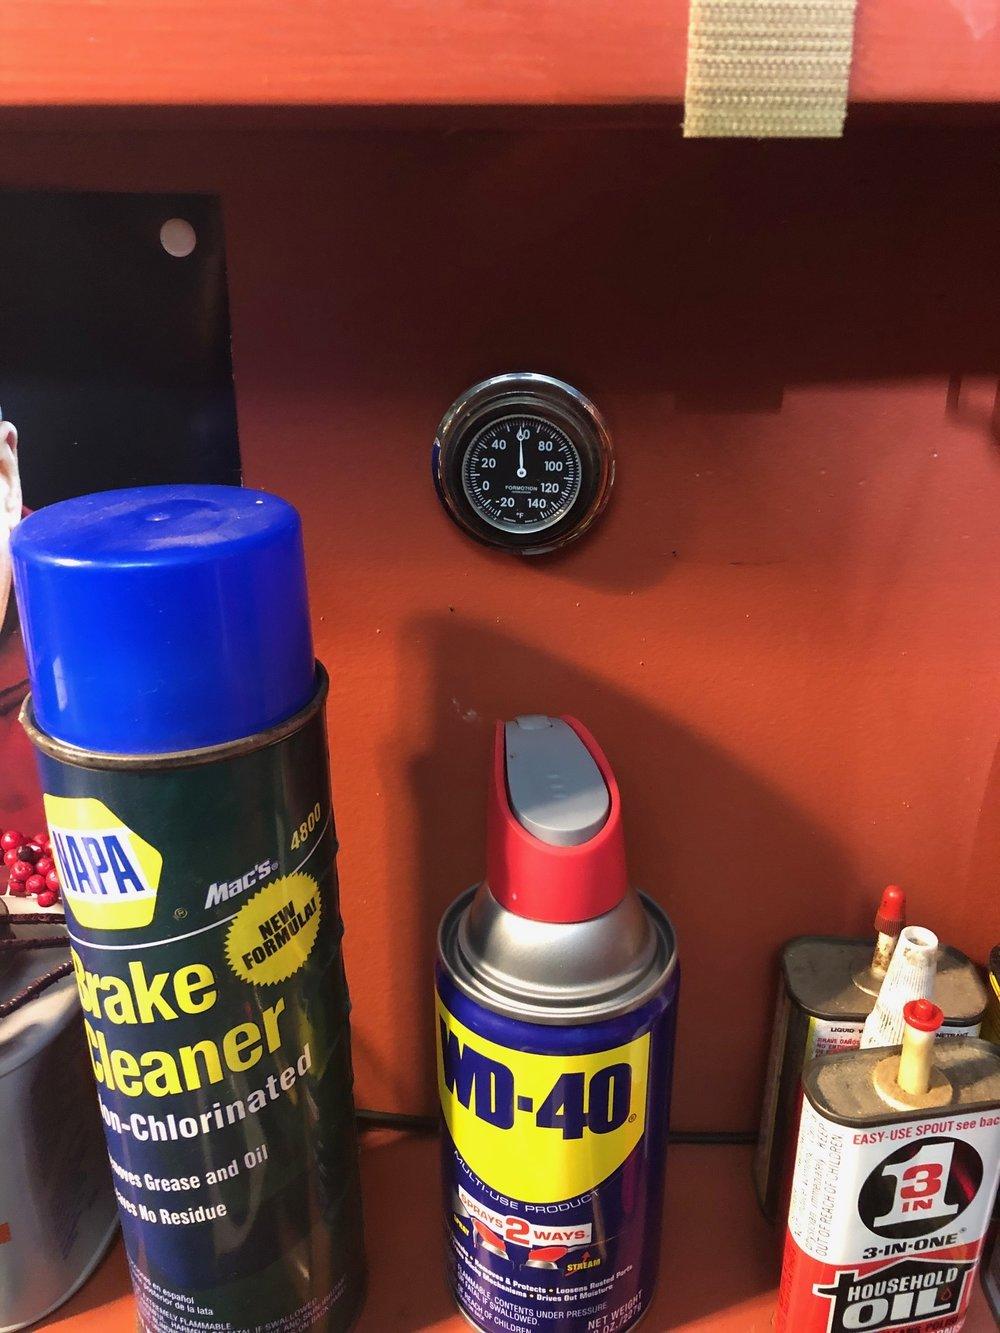 Workbench Thermometer.jpg